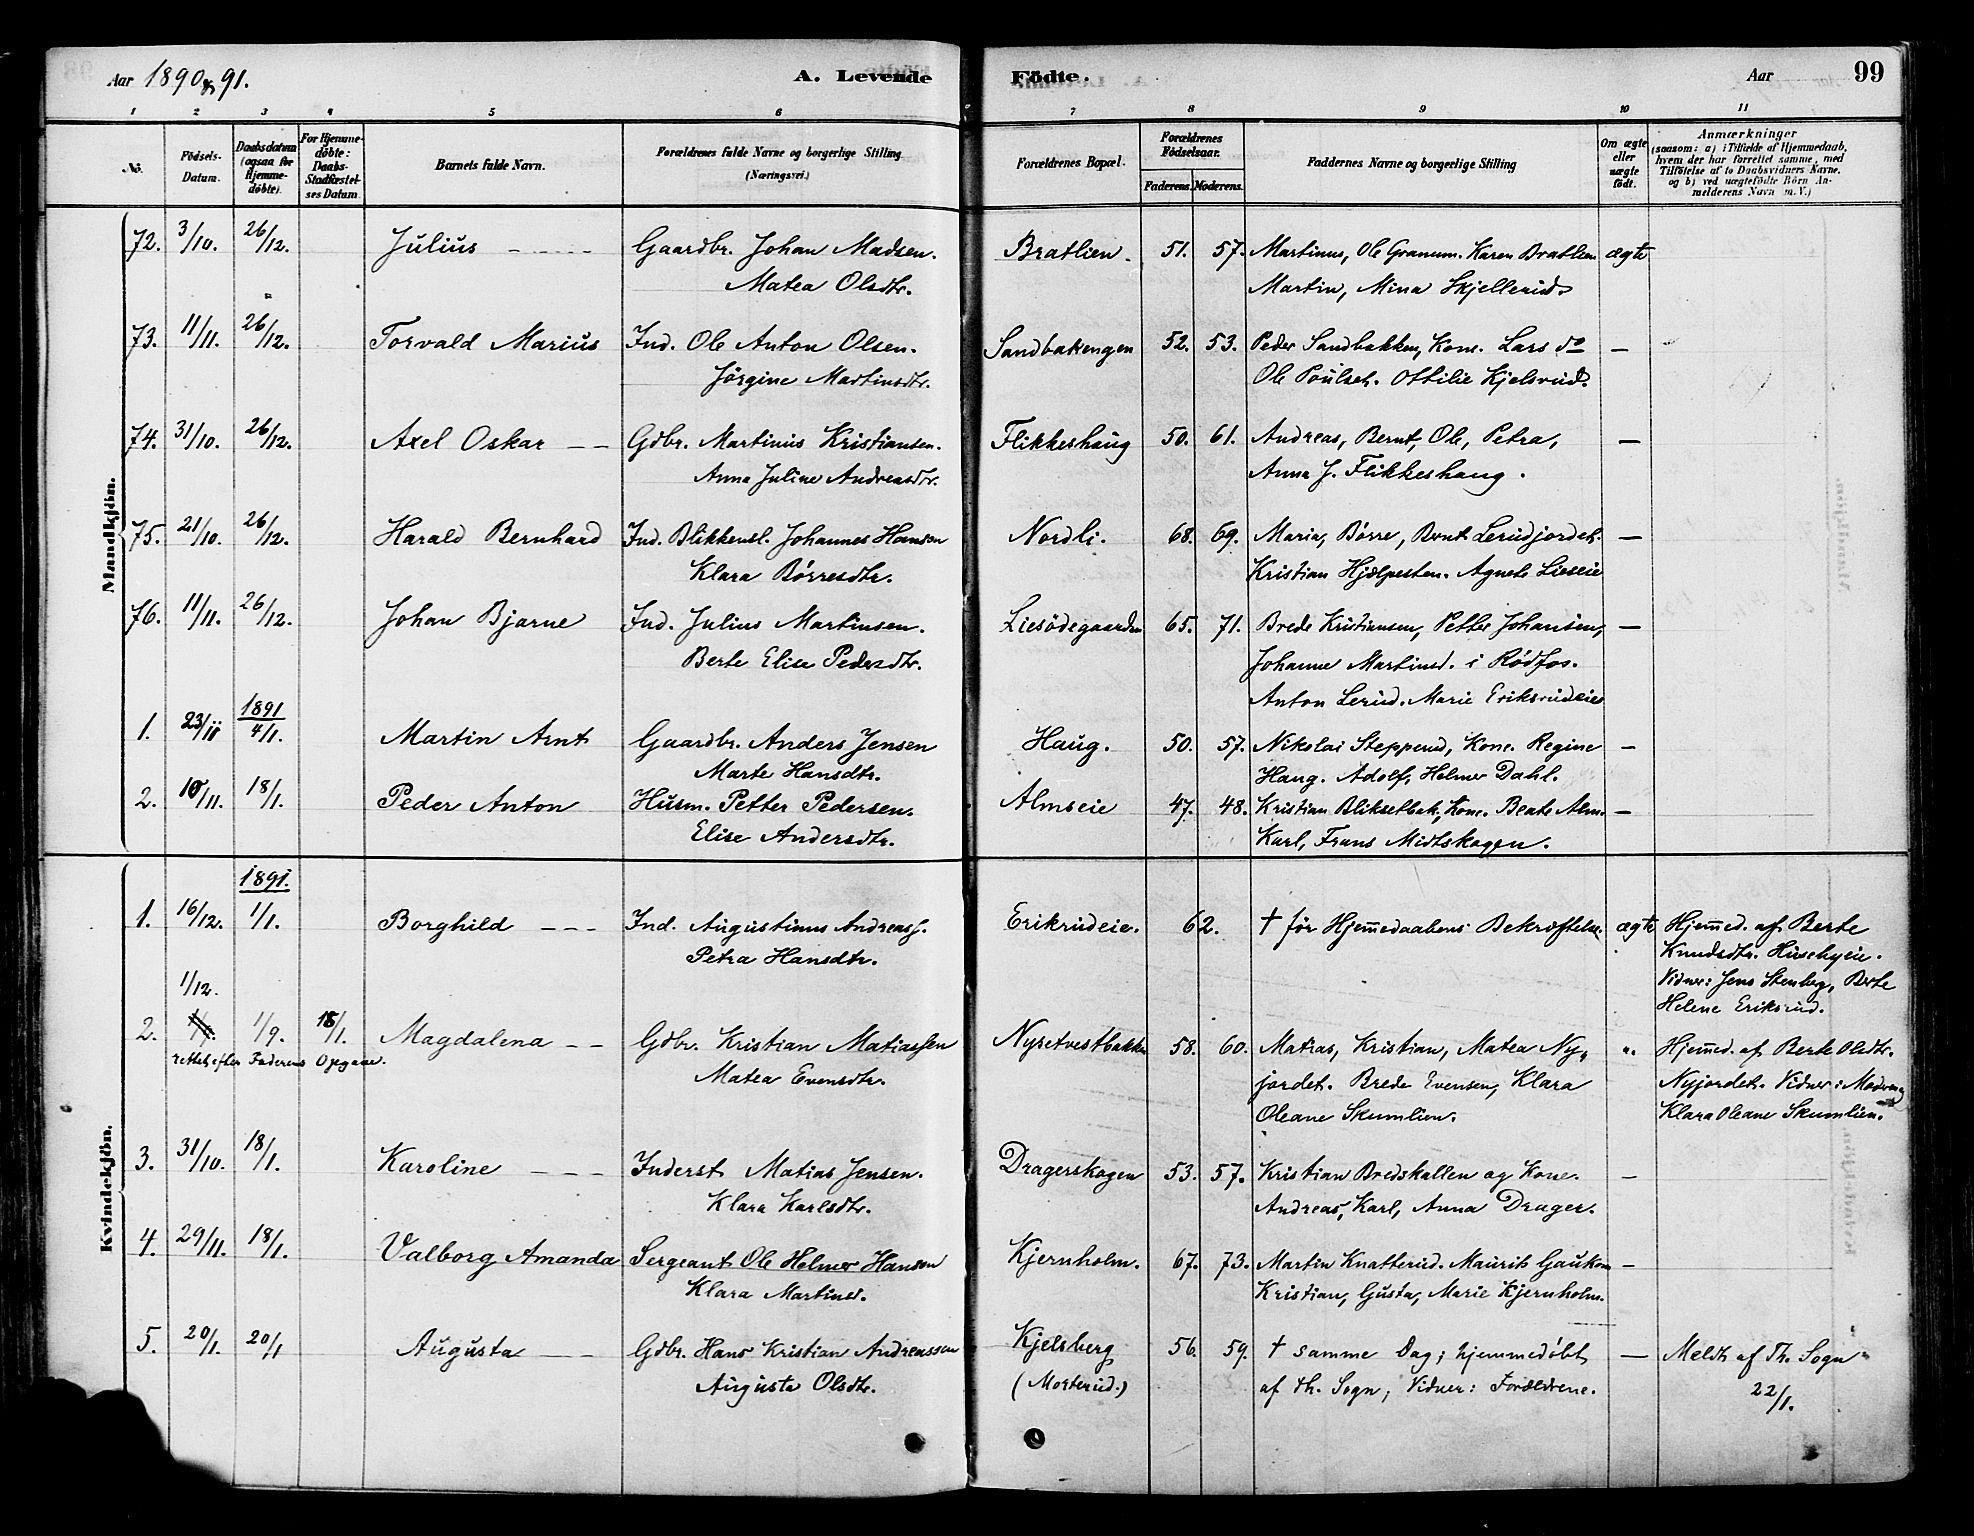 SAH, Vestre Toten prestekontor, H/Ha/Haa/L0009: Ministerialbok nr. 9, 1878-1894, s. 99